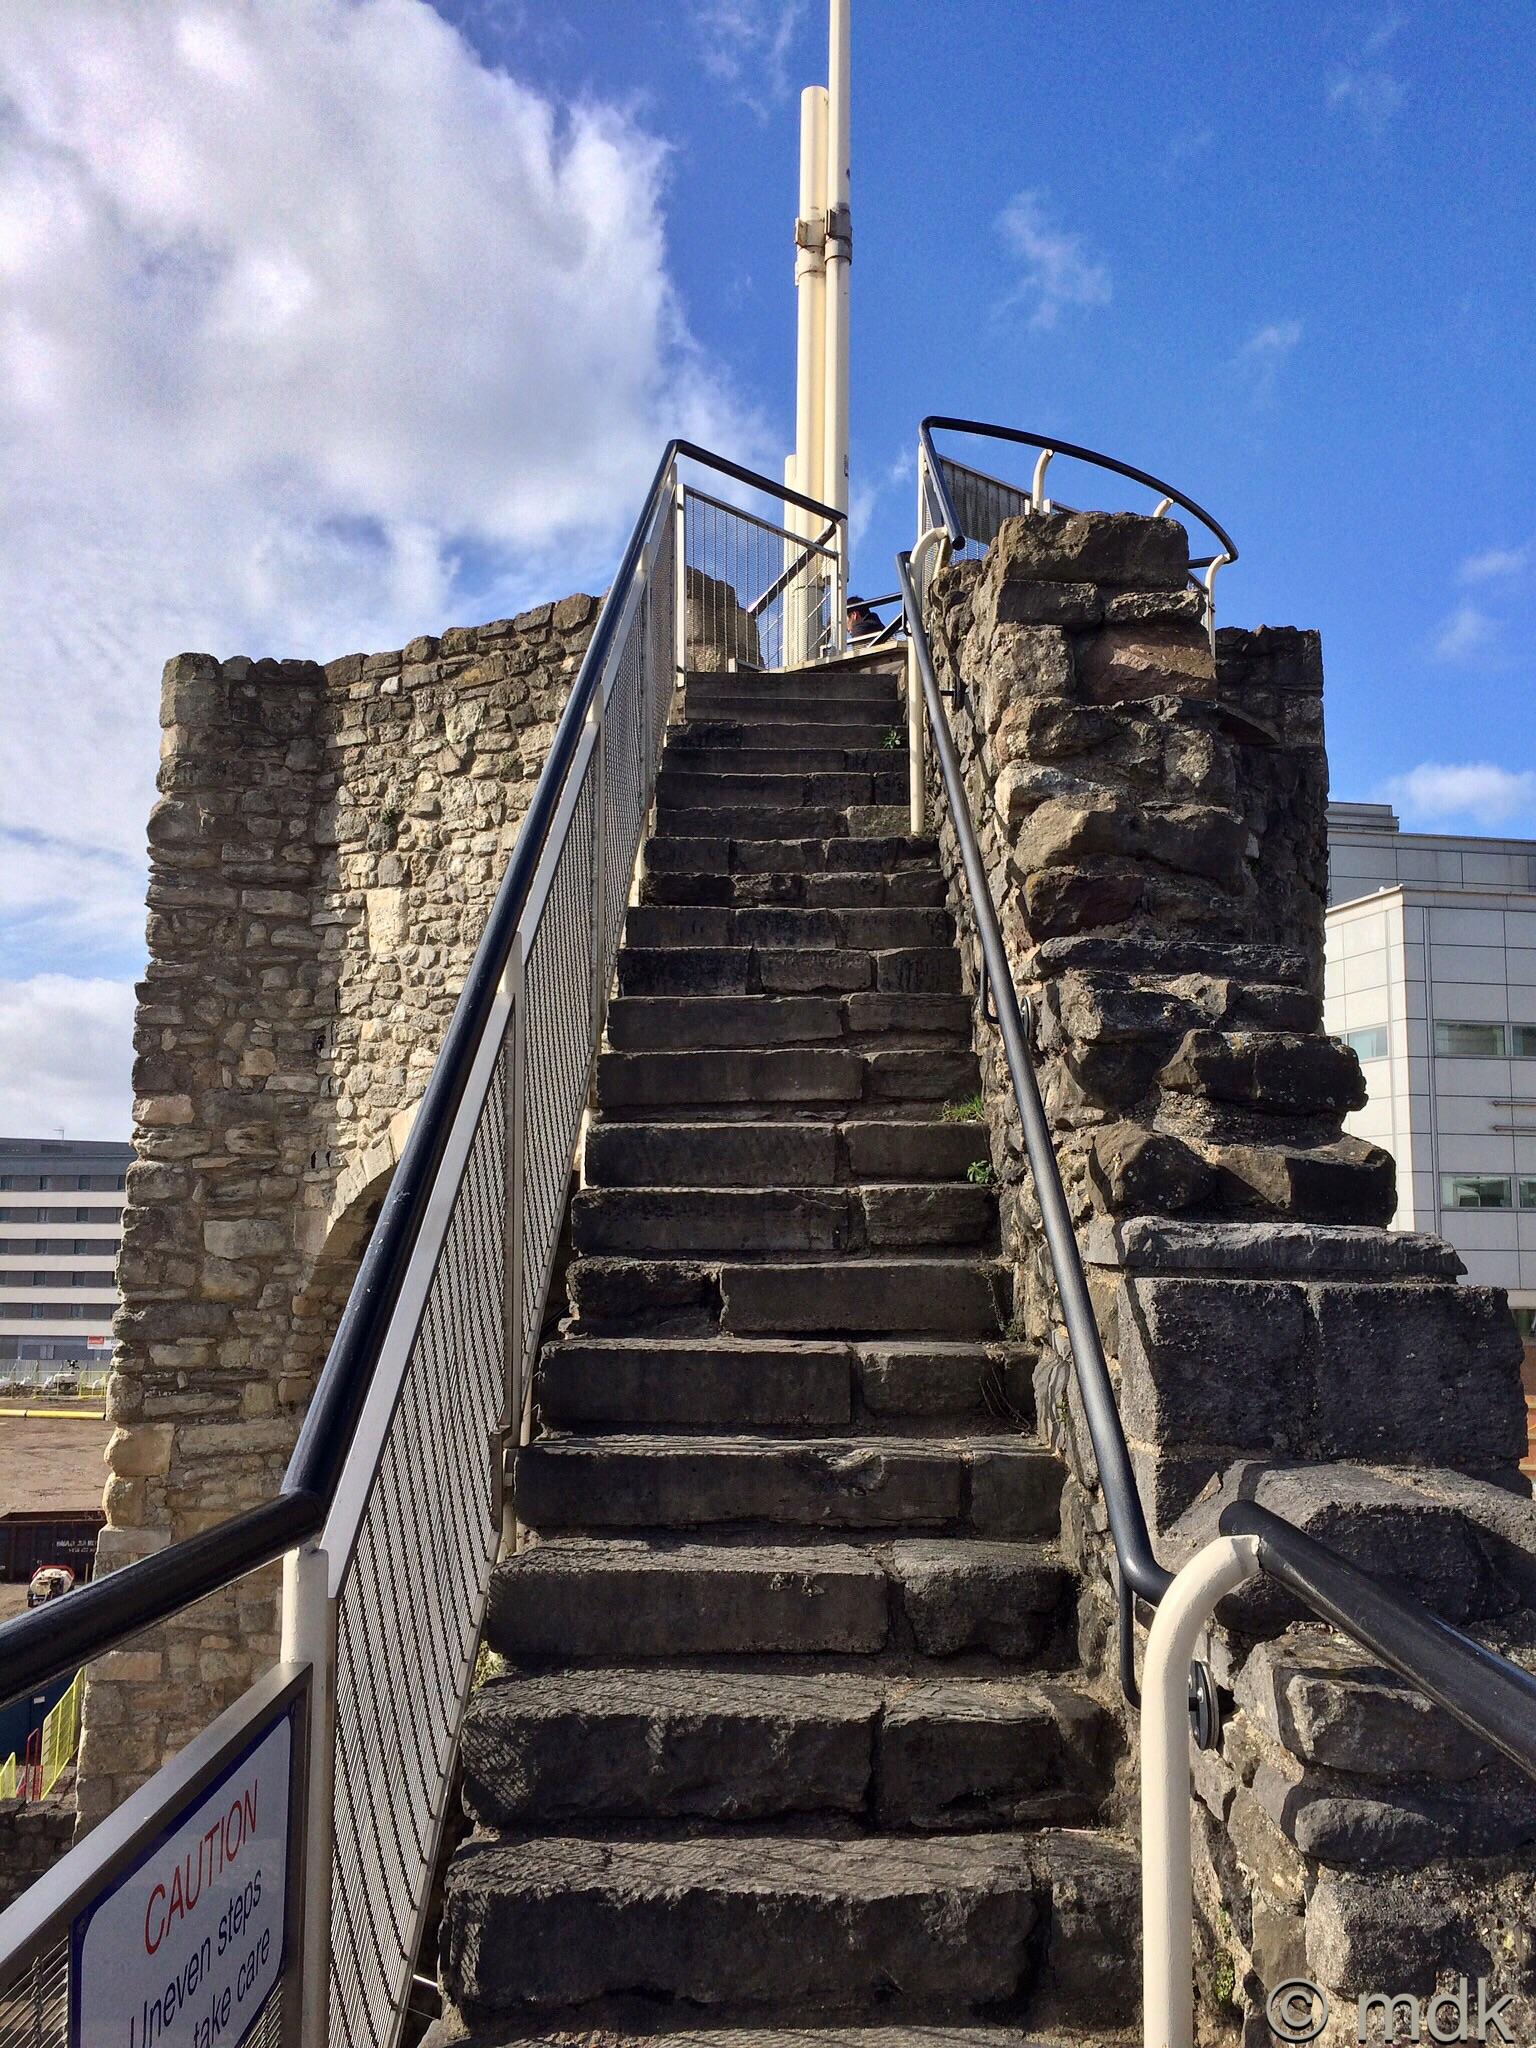 Arundel Tower